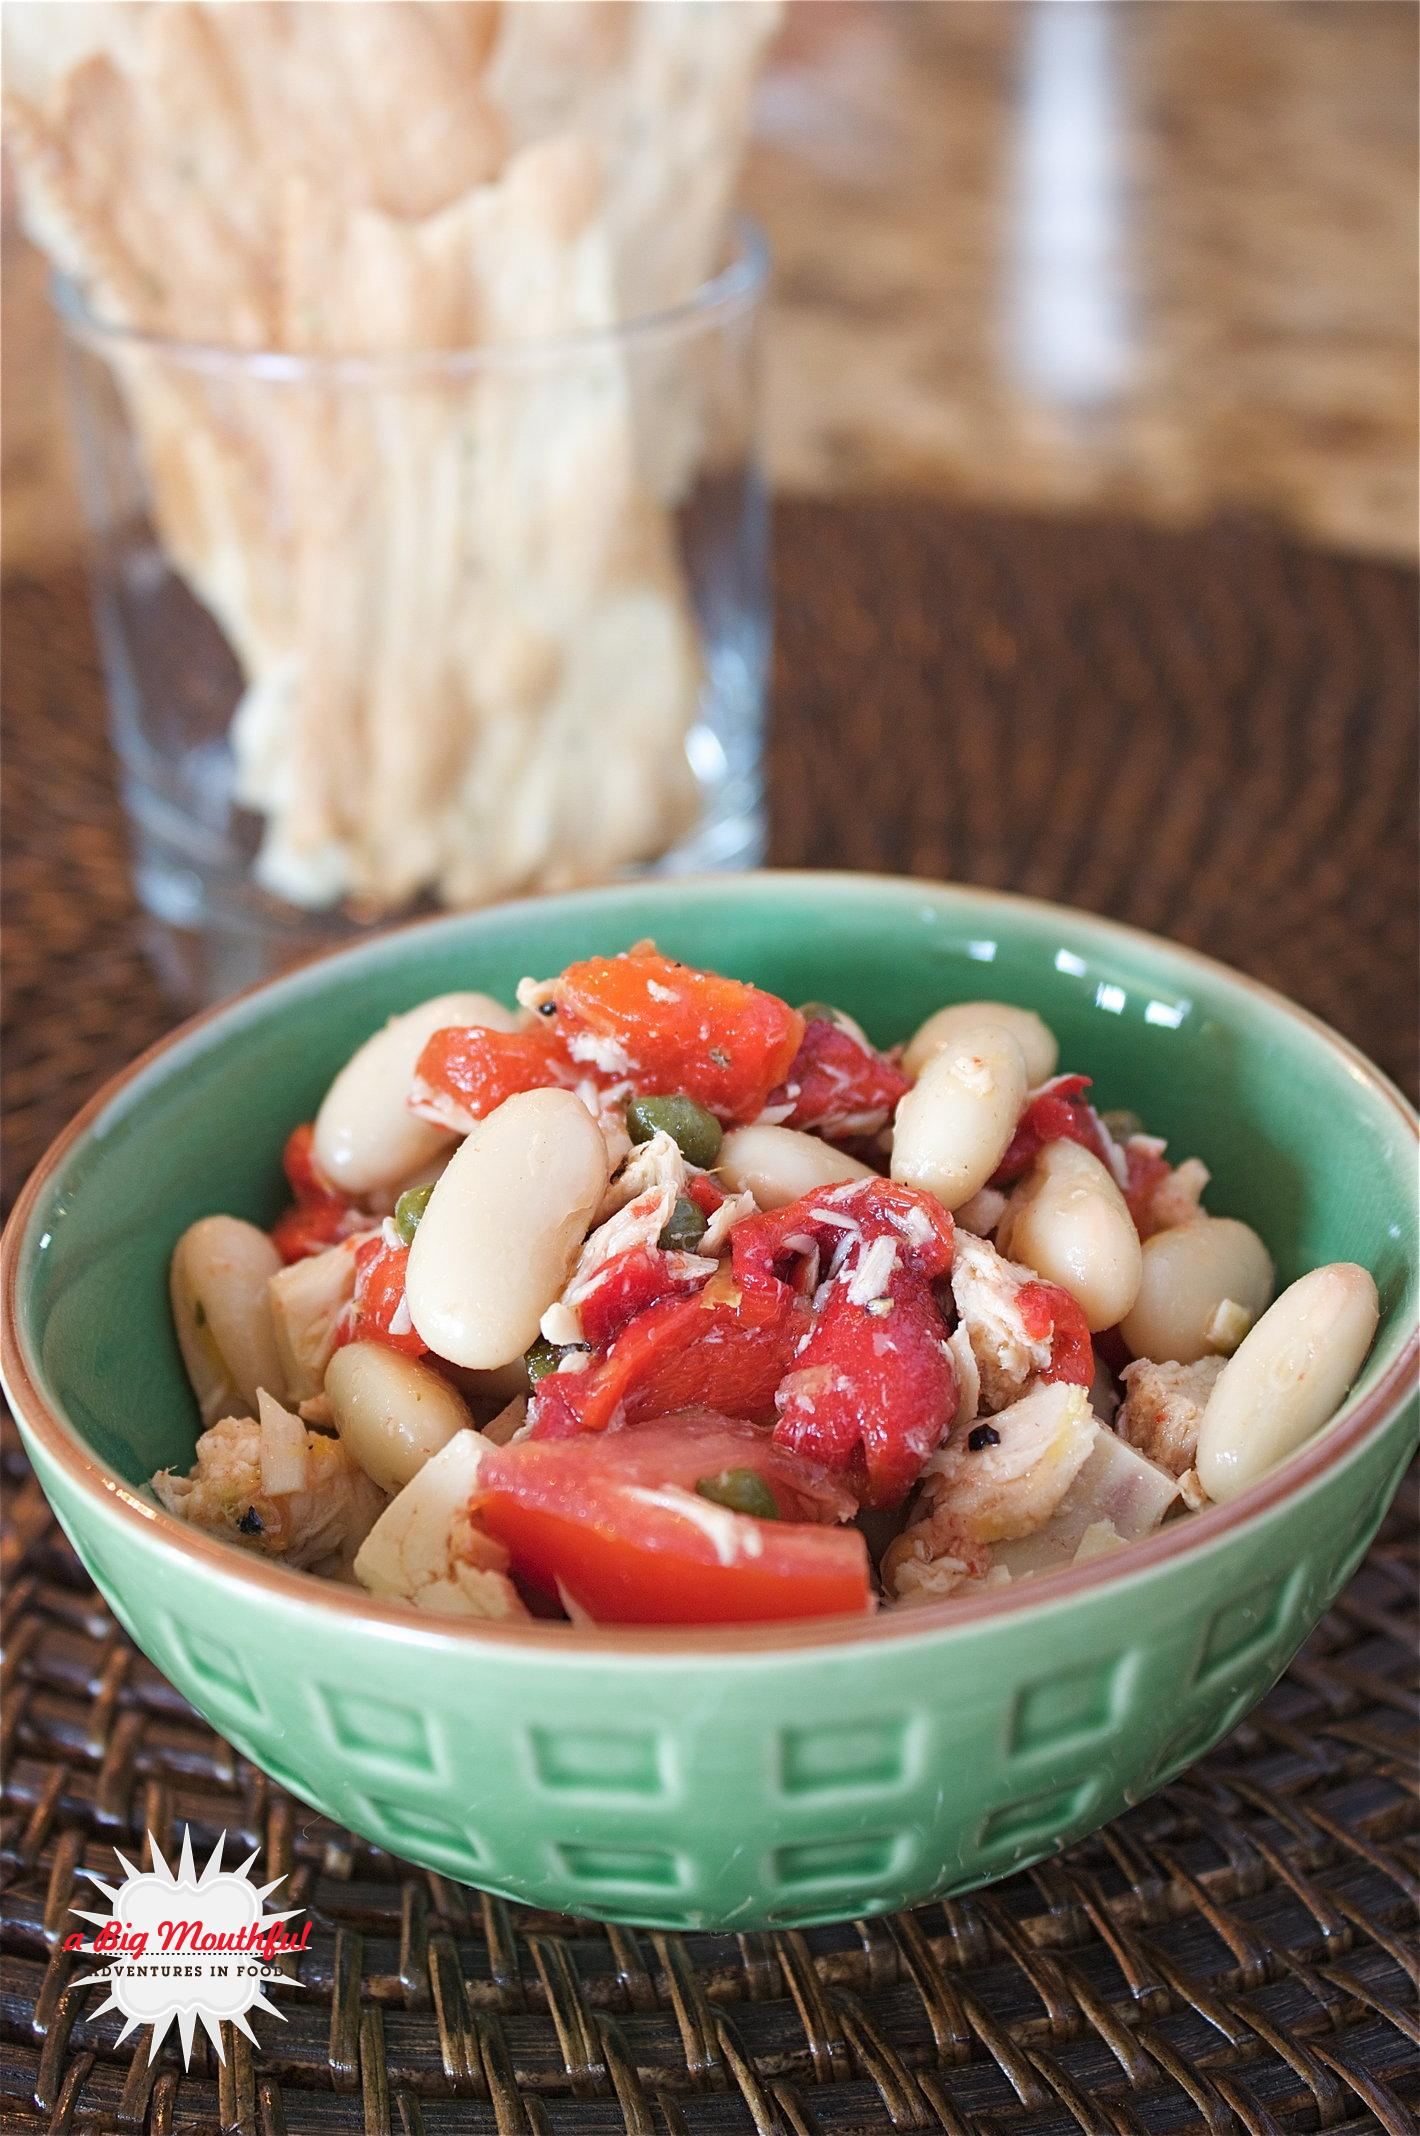 Lemony Tuna and White Bean Salad